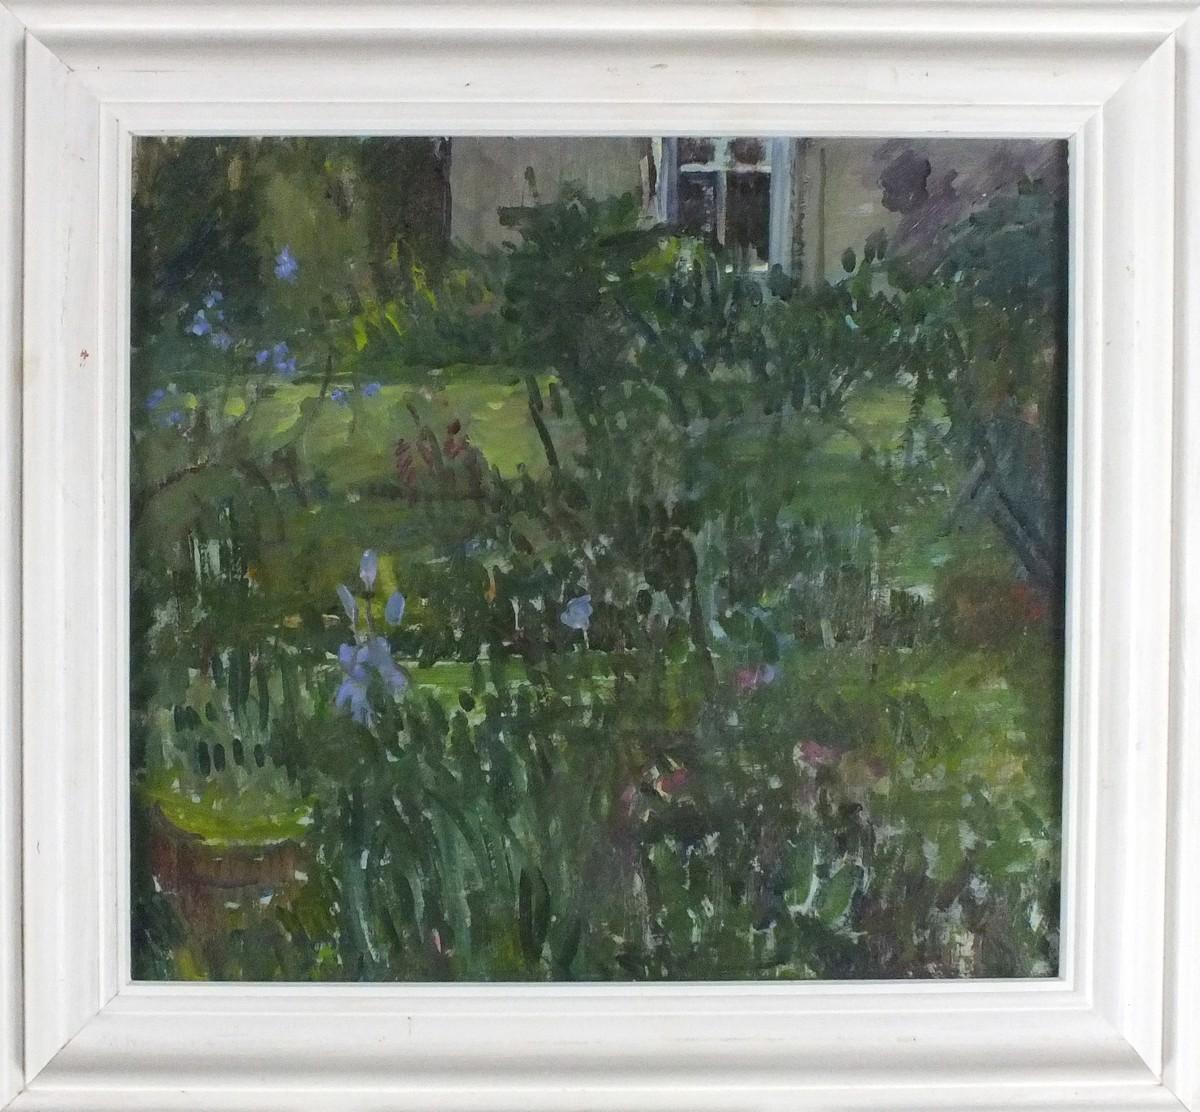 Lot 11 - Pat ALGAR (British 1939 - 2013) 'Chymorvah' - The Artist's Garden, Oil on board, Signed,